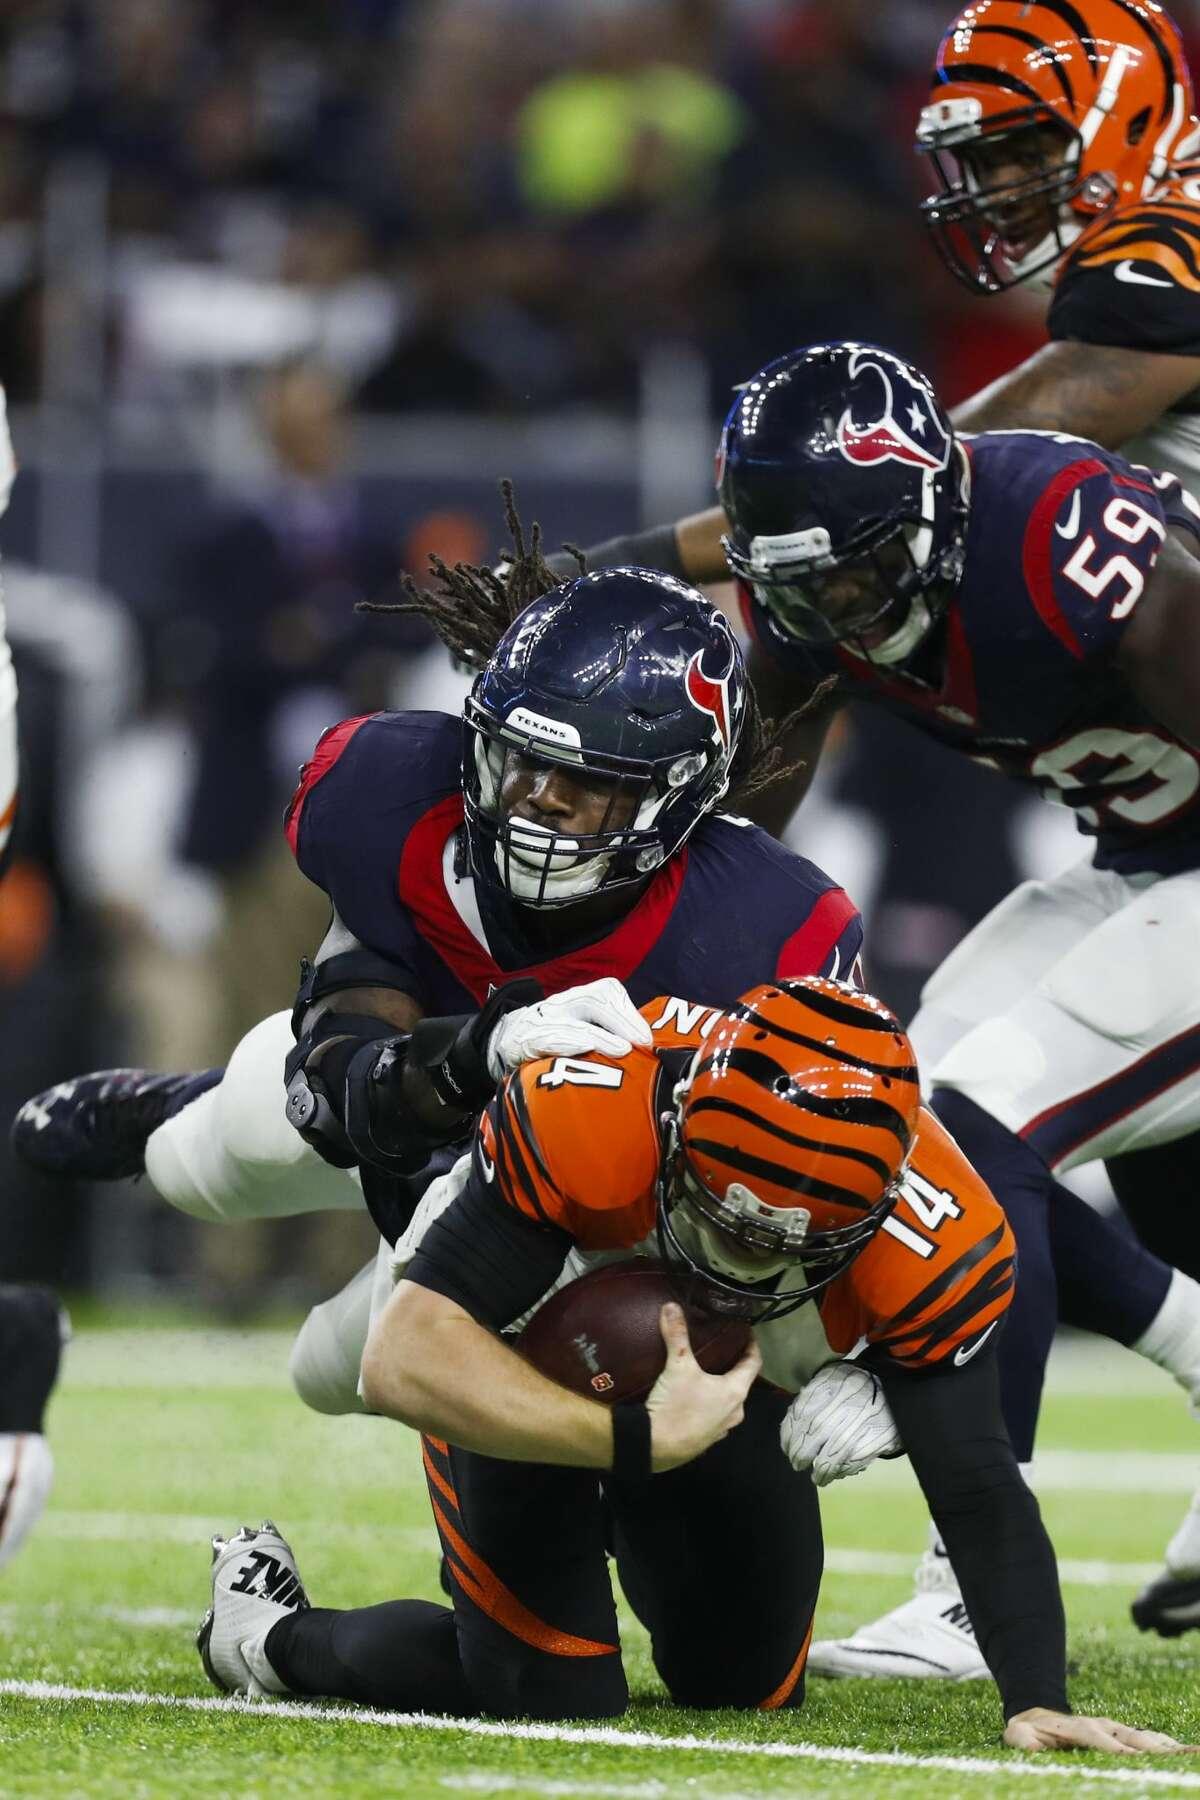 Houston Texans defensive end Jadeveon Clowney (90) sacks Cincinnati Bengals quarterback Andy Dalton (14) during the second quarter of an NFL football game at NRG Stadium, Saturday,Dec. 24, 2016 in Houston. ( Karen Warren / Houston Chronicle )